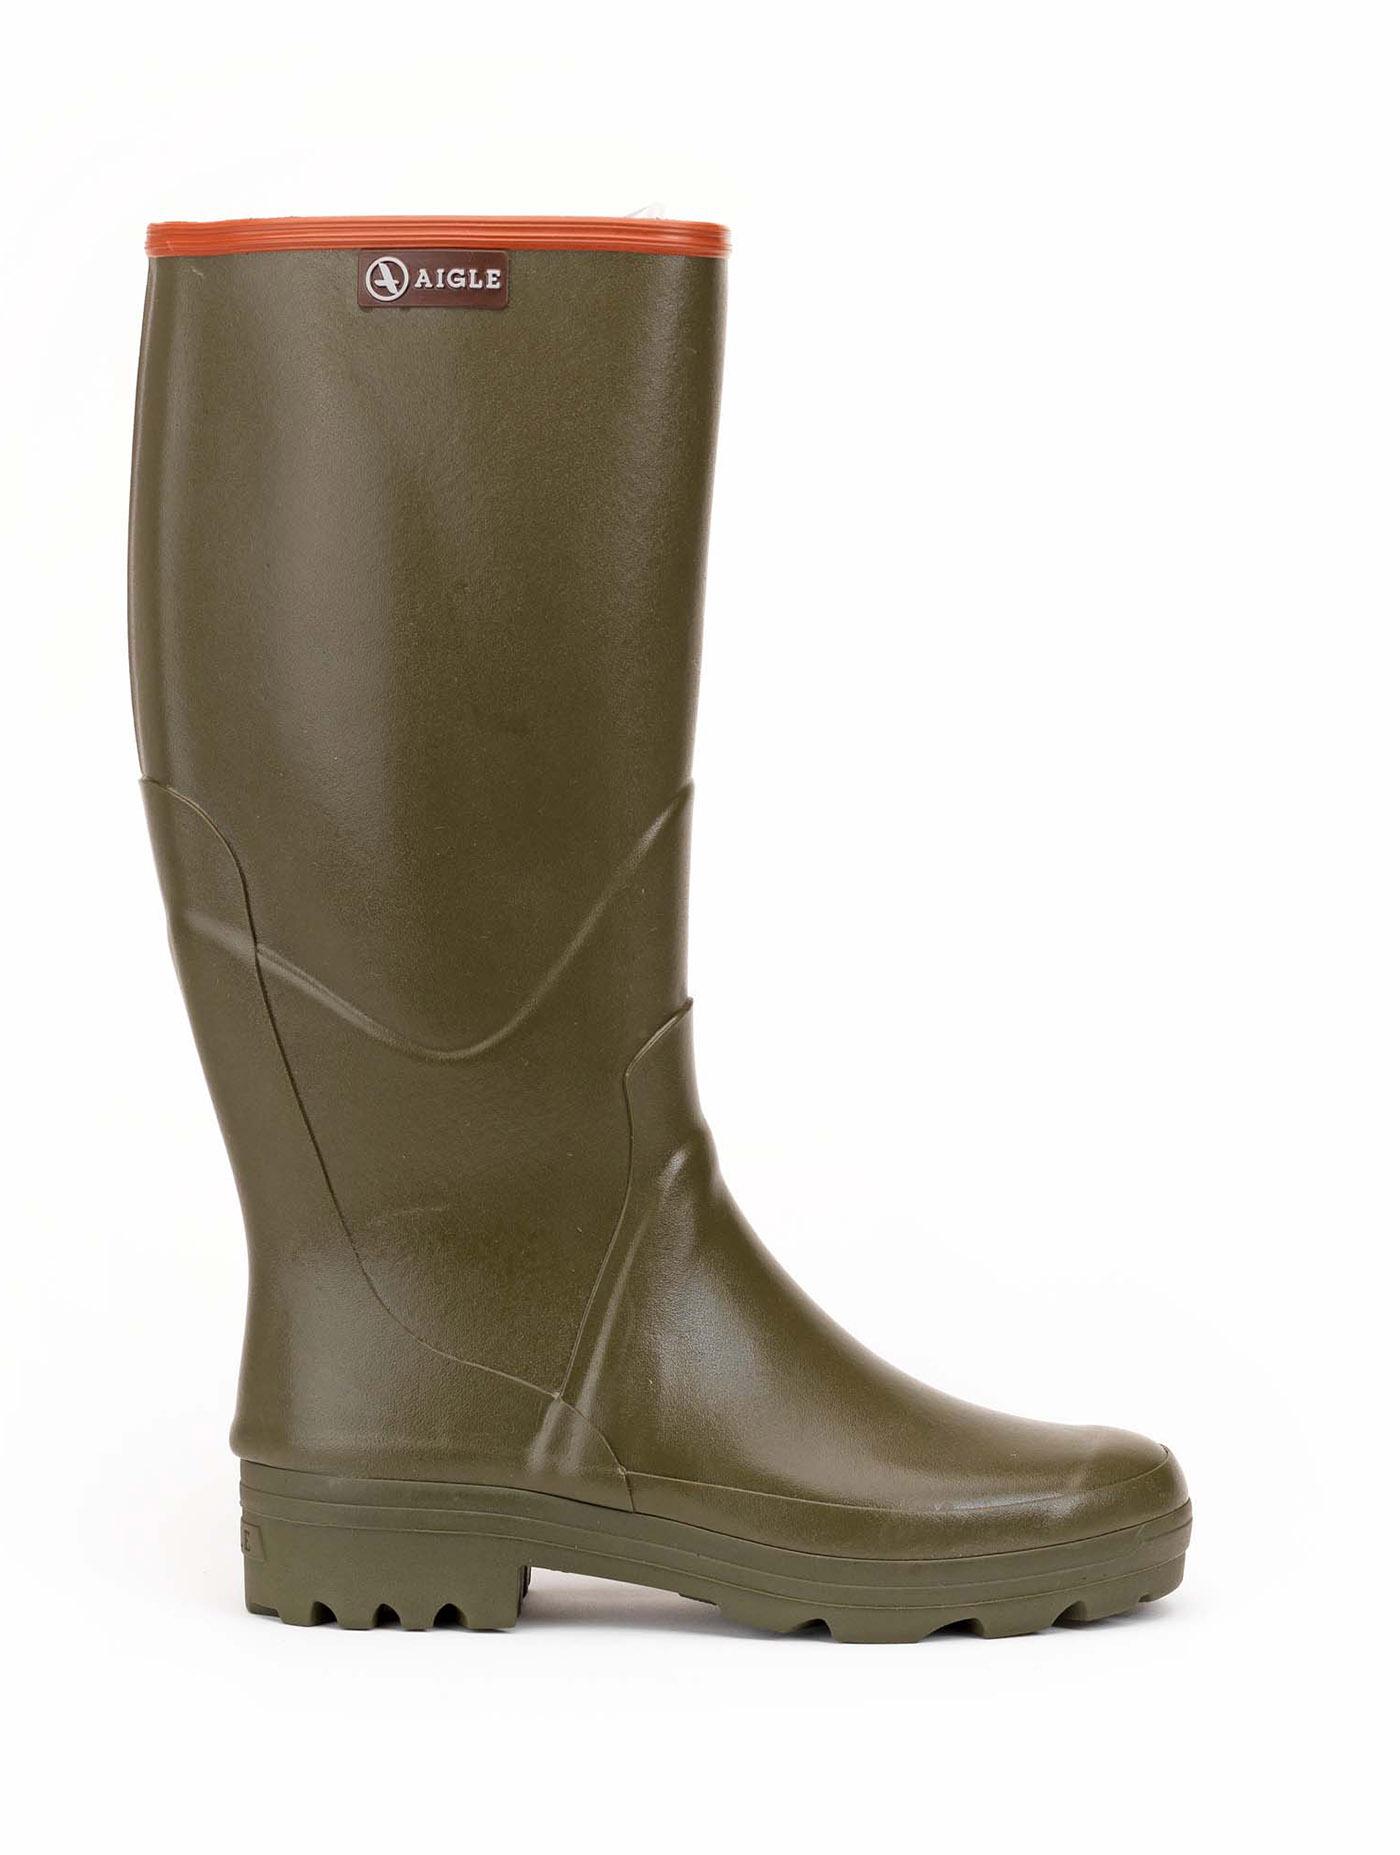 CHAMBORD PRO | Men's all terrain rubber boots Kaki